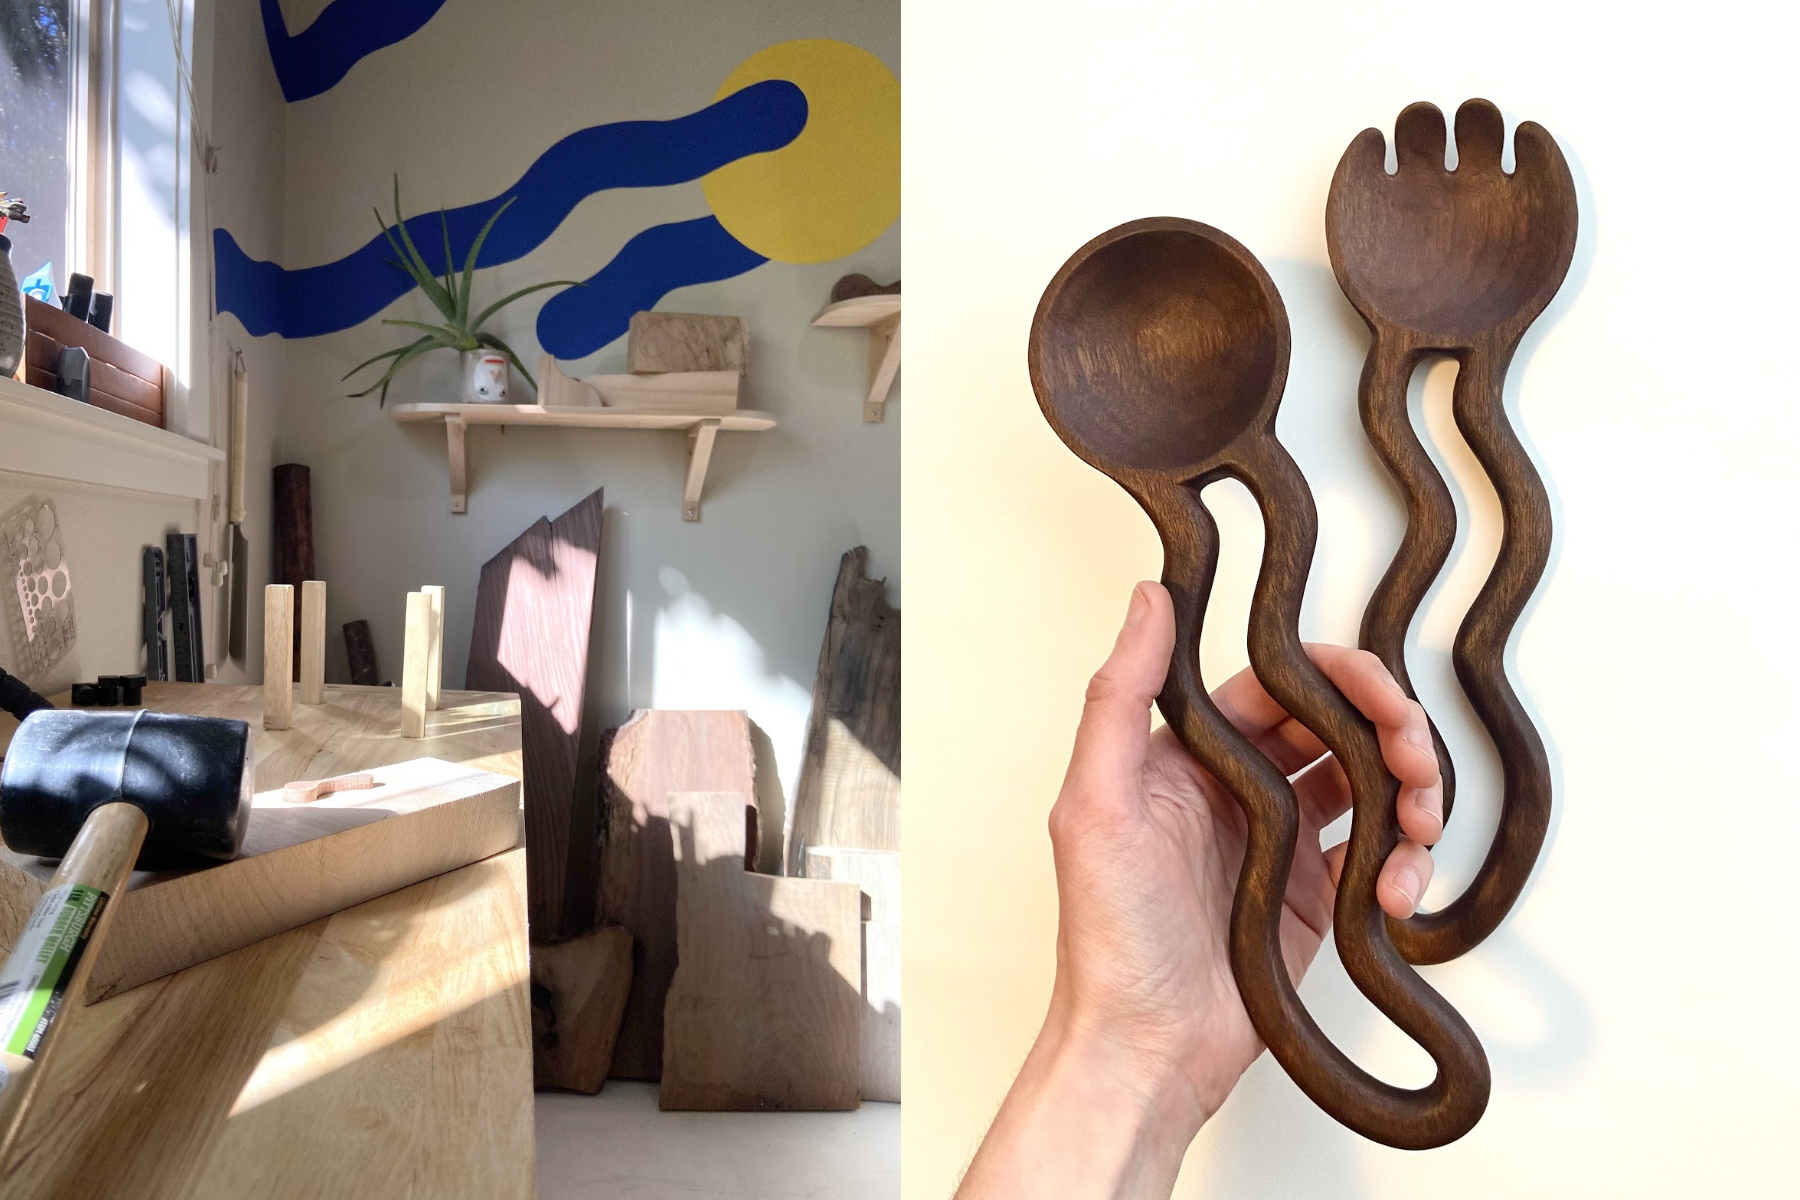 Wood carver Anya Walker featured